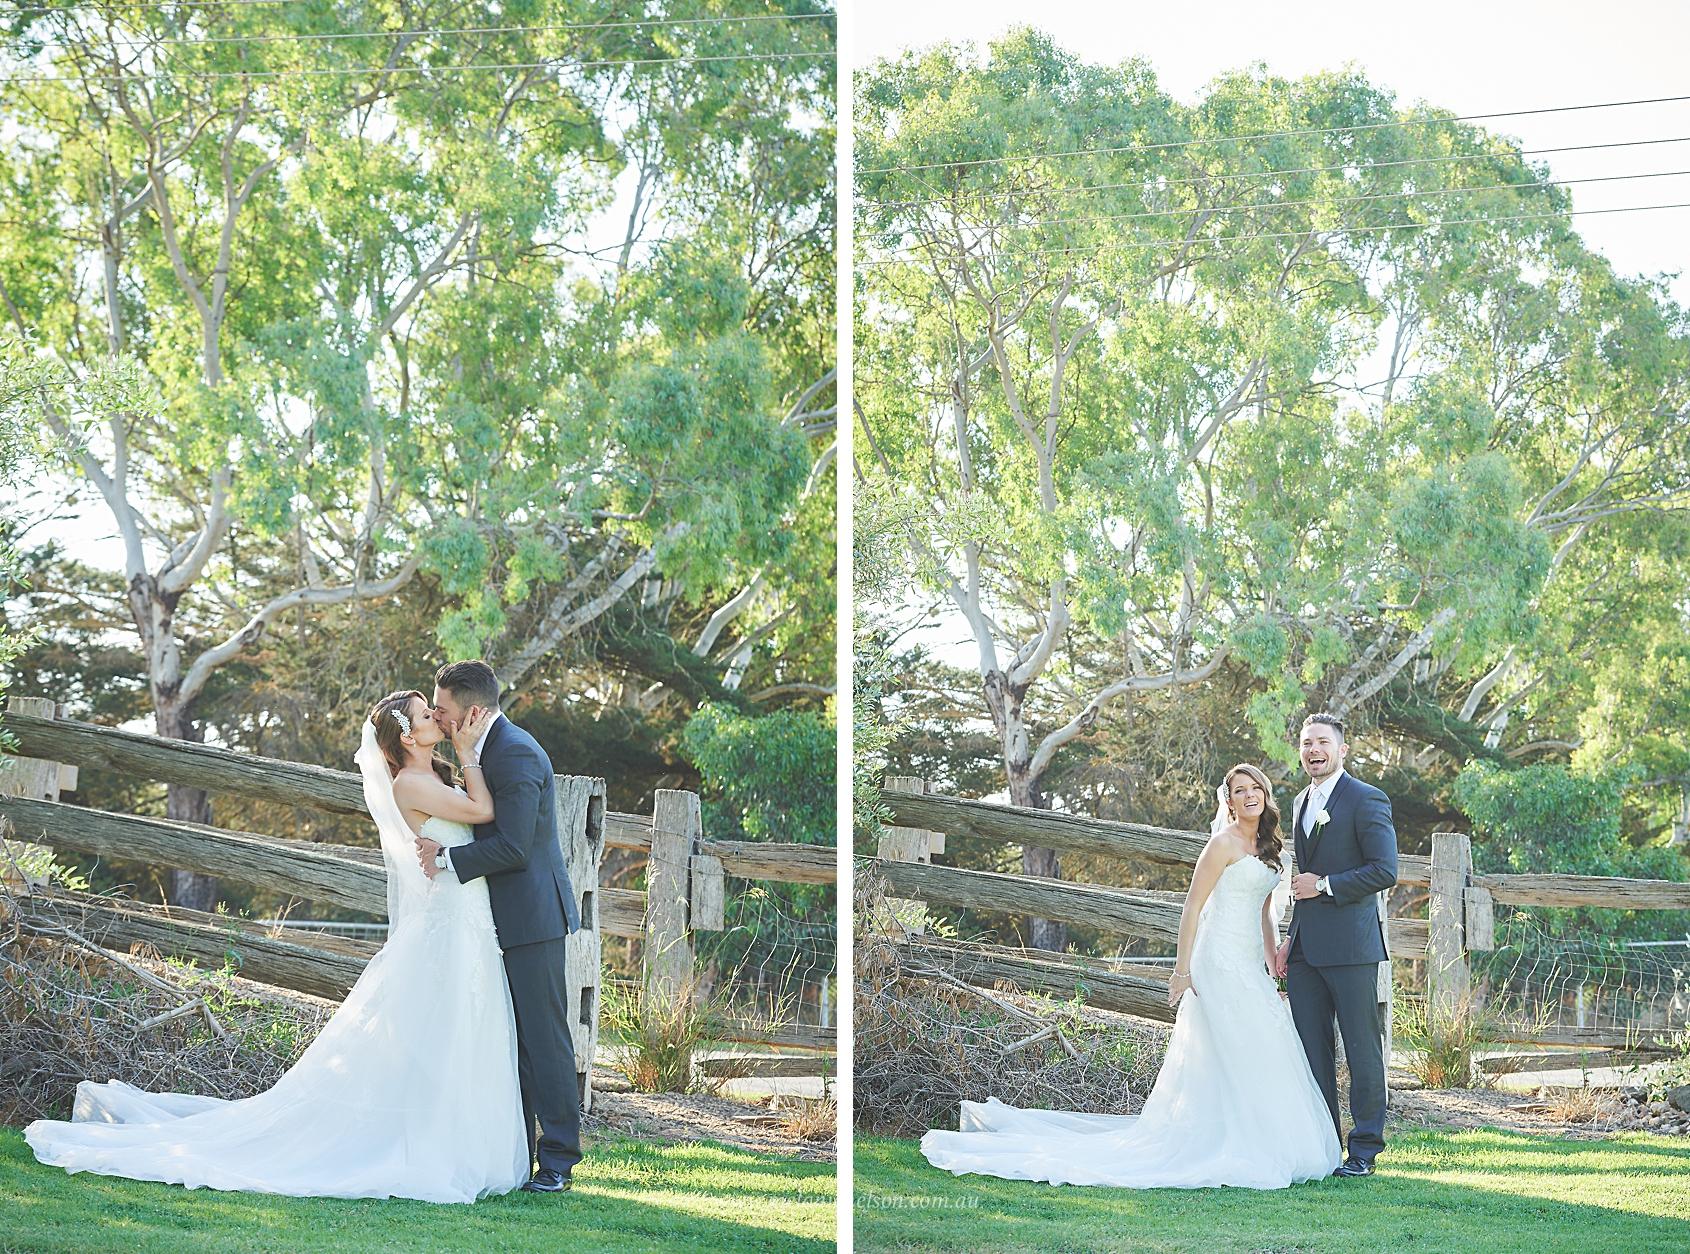 bird_in_hand_wedding_021.jpg